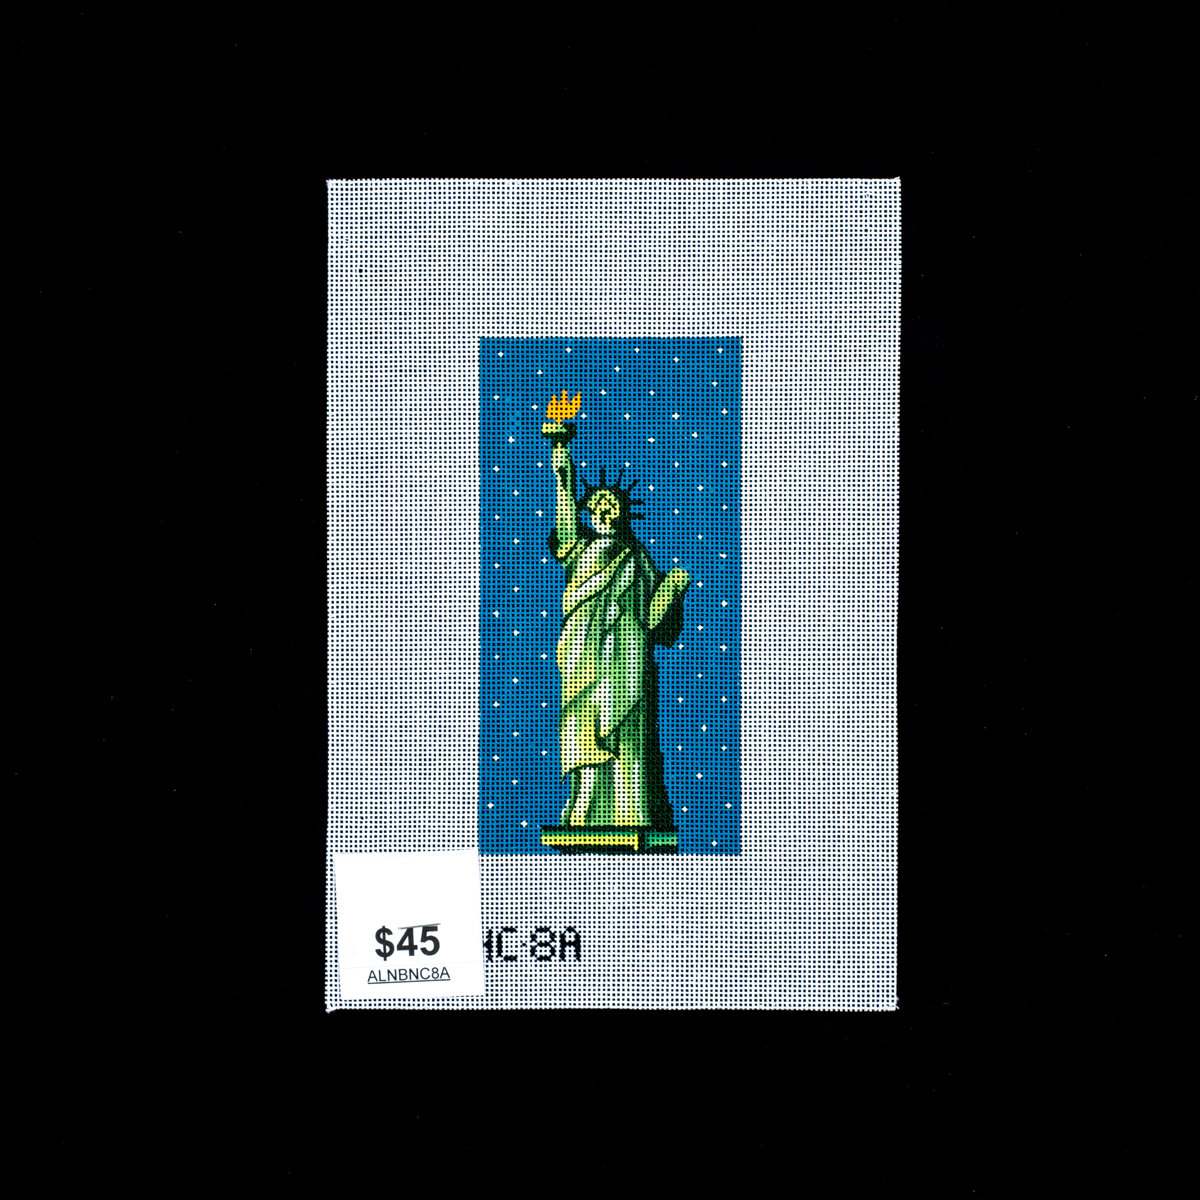 Amanda Lawford, Statue of Liberty, ALNBNC8A